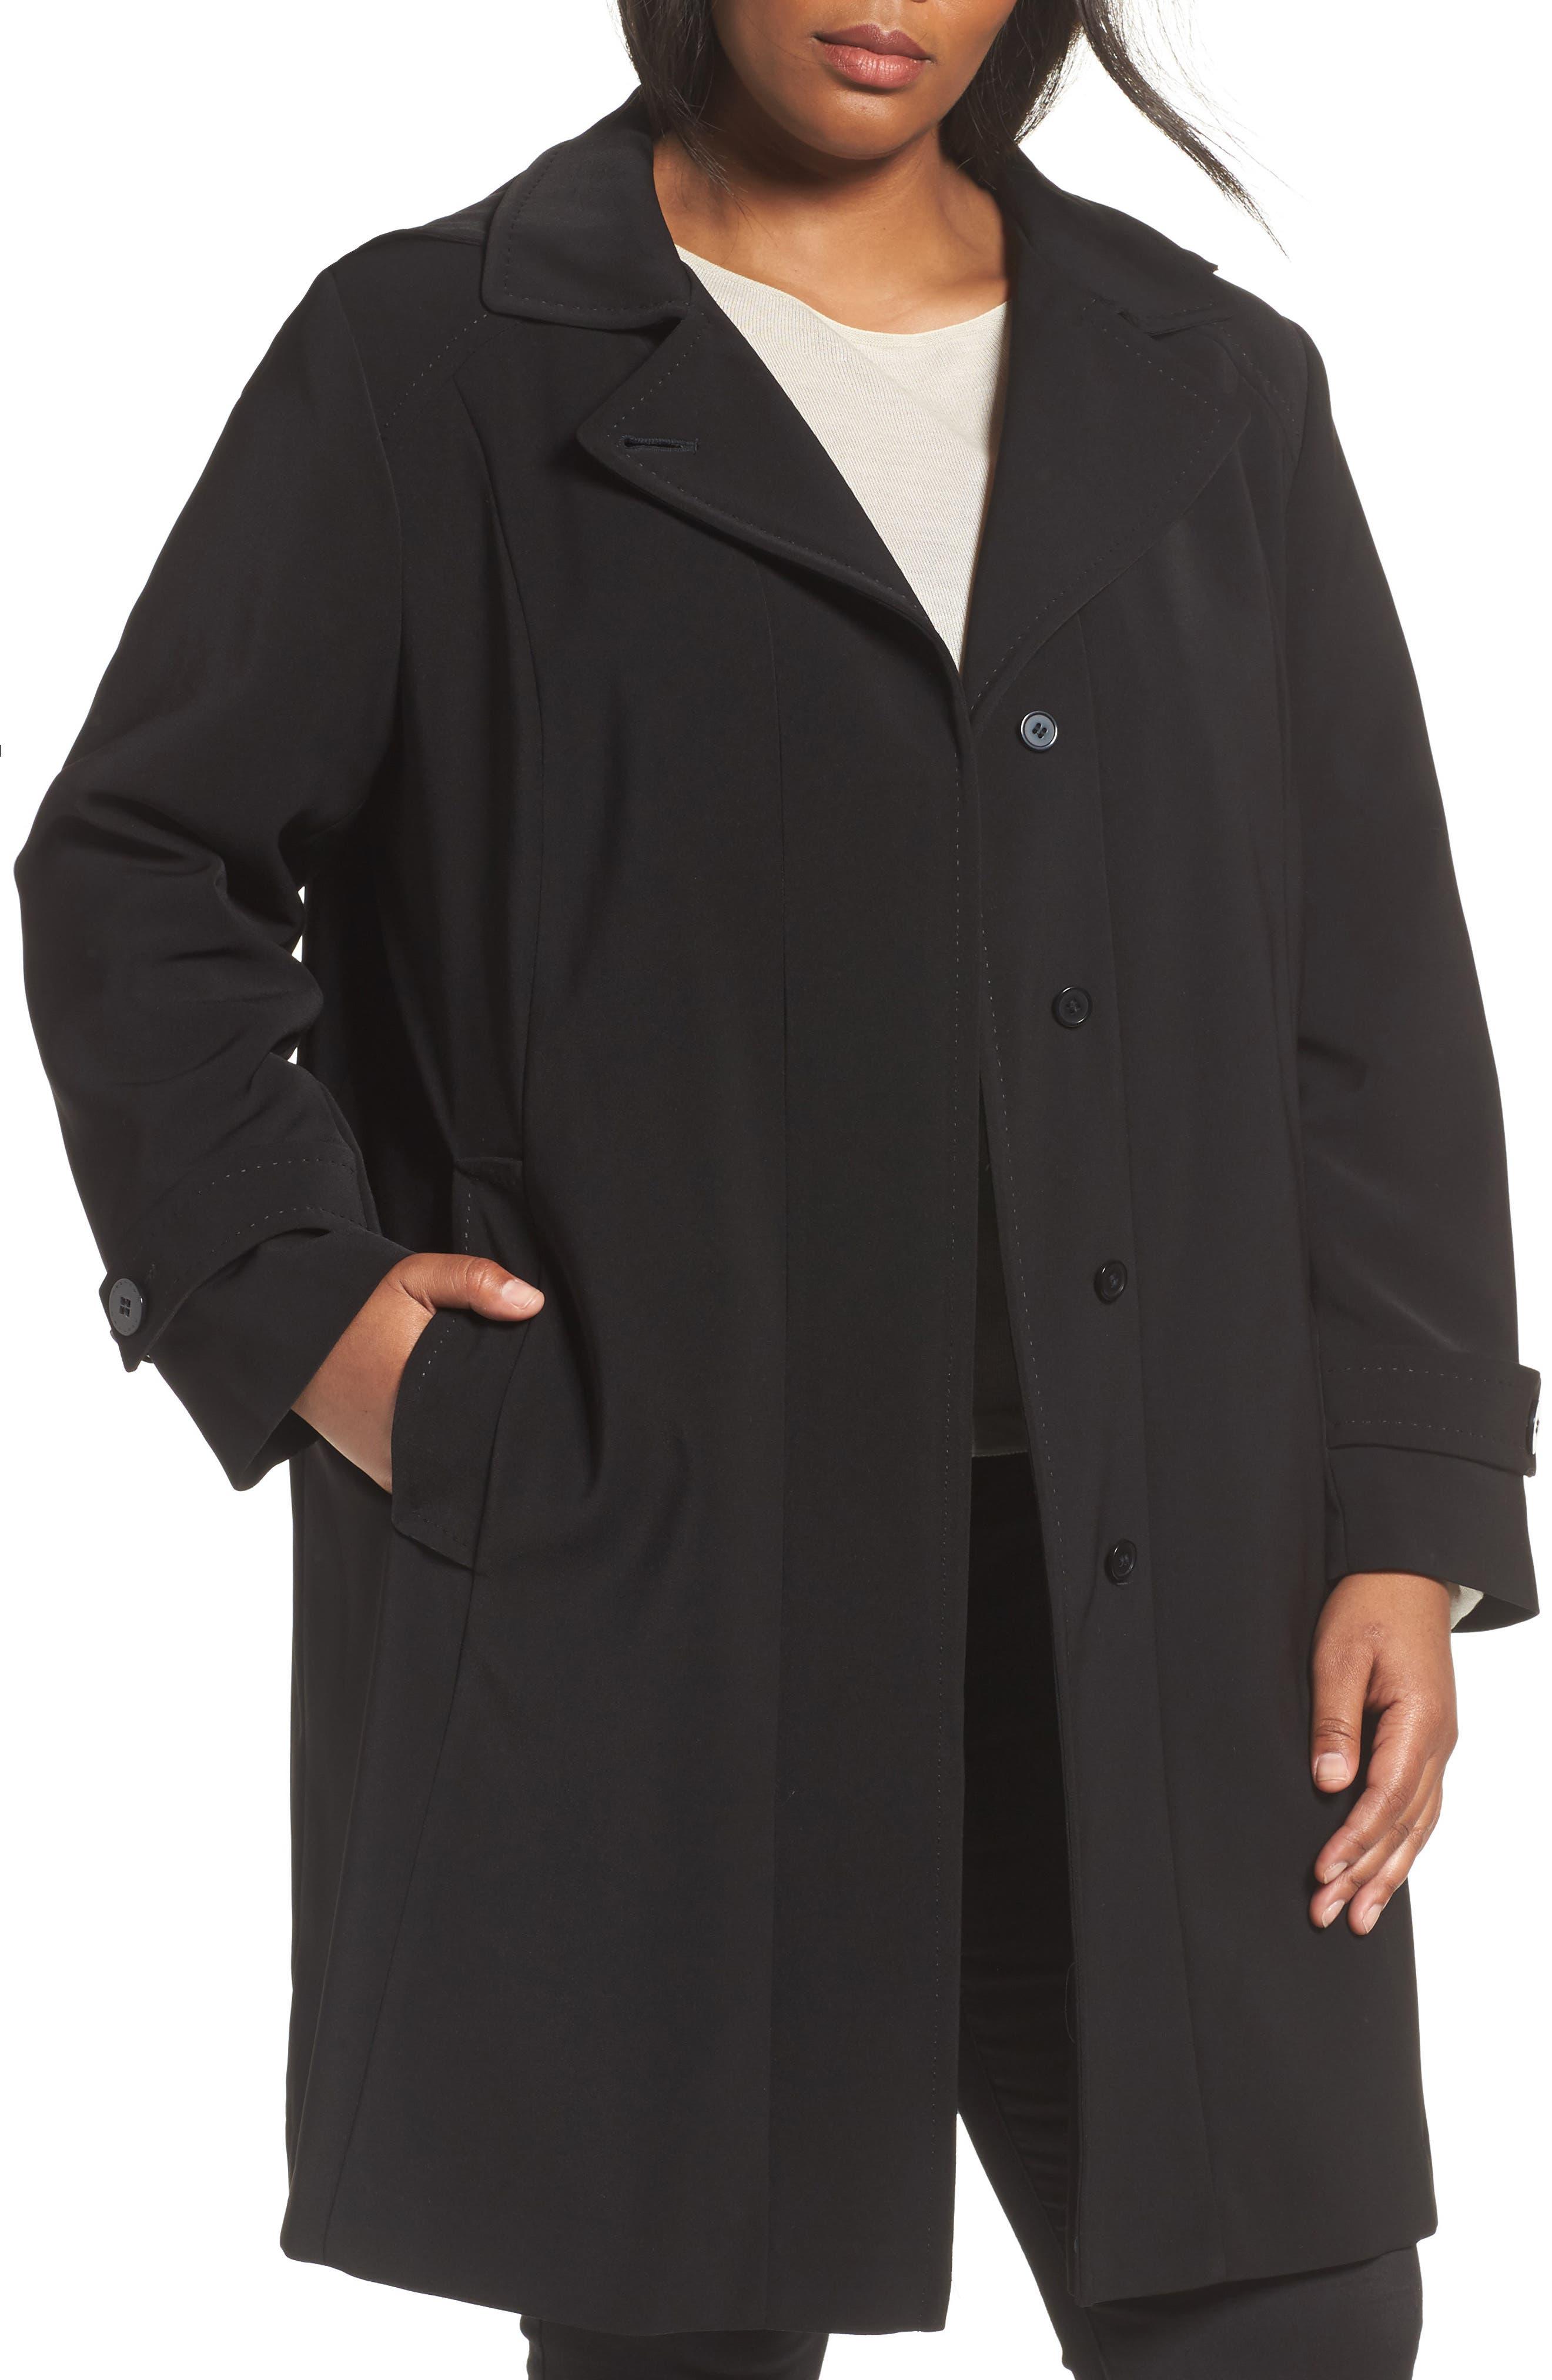 A-Line Raincoat with Detachable Hood & Liner,                             Main thumbnail 1, color,                             001